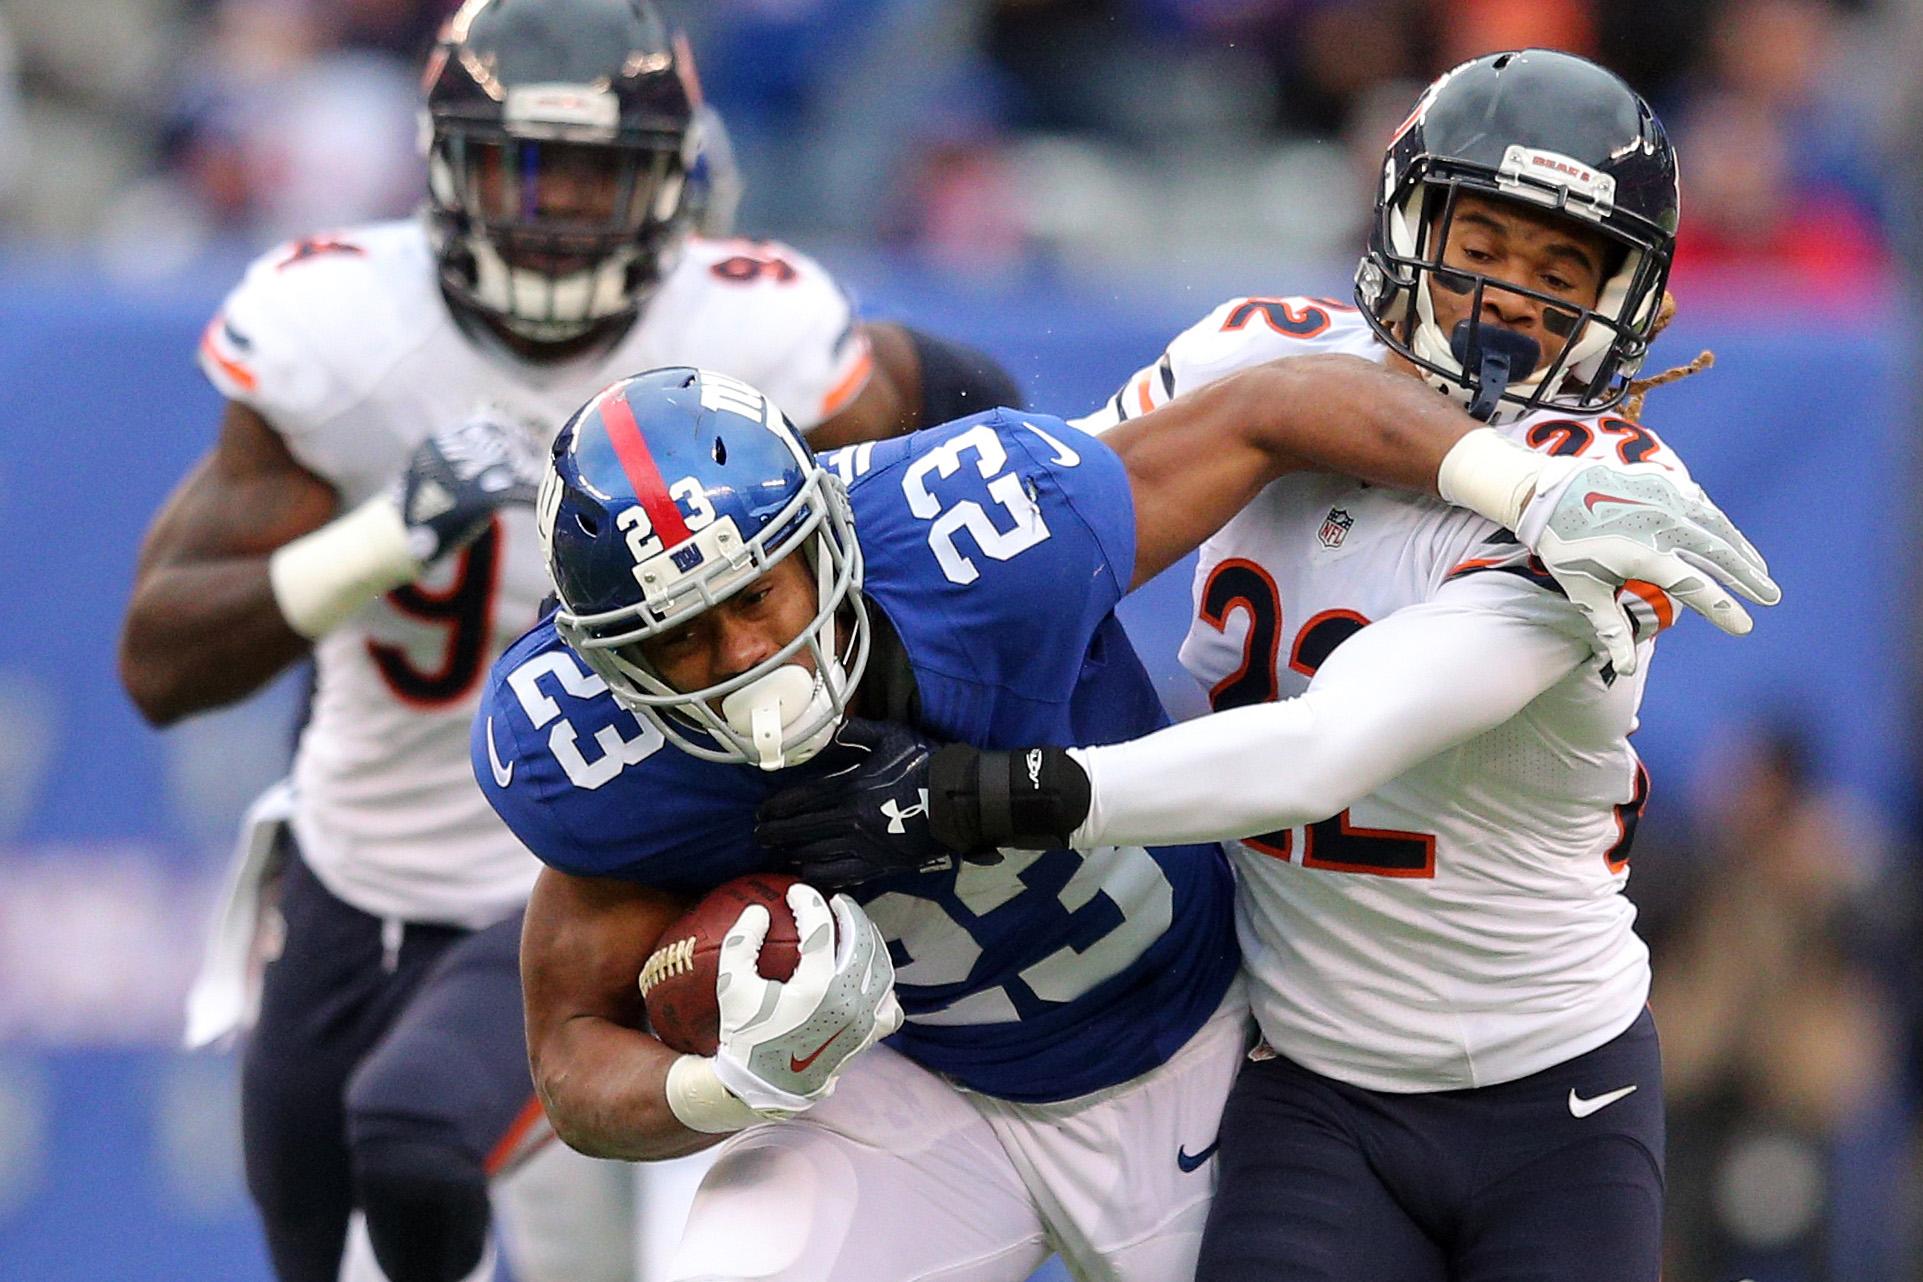 NFL: Chicago Bears at New York Giants